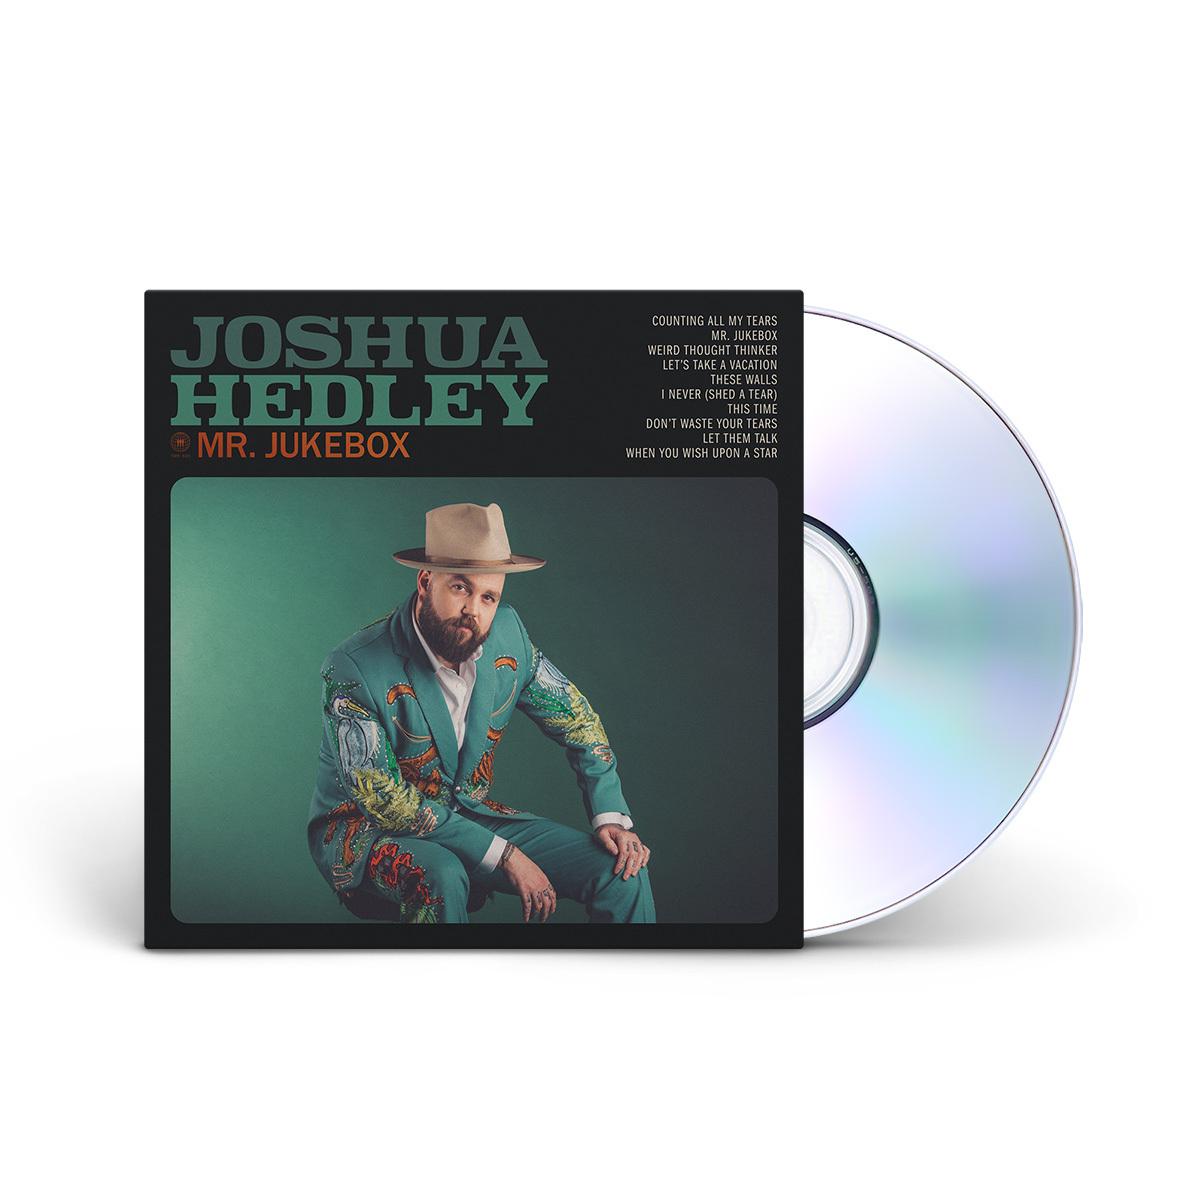 Joshua Hedley - Mr. Jukebox CD